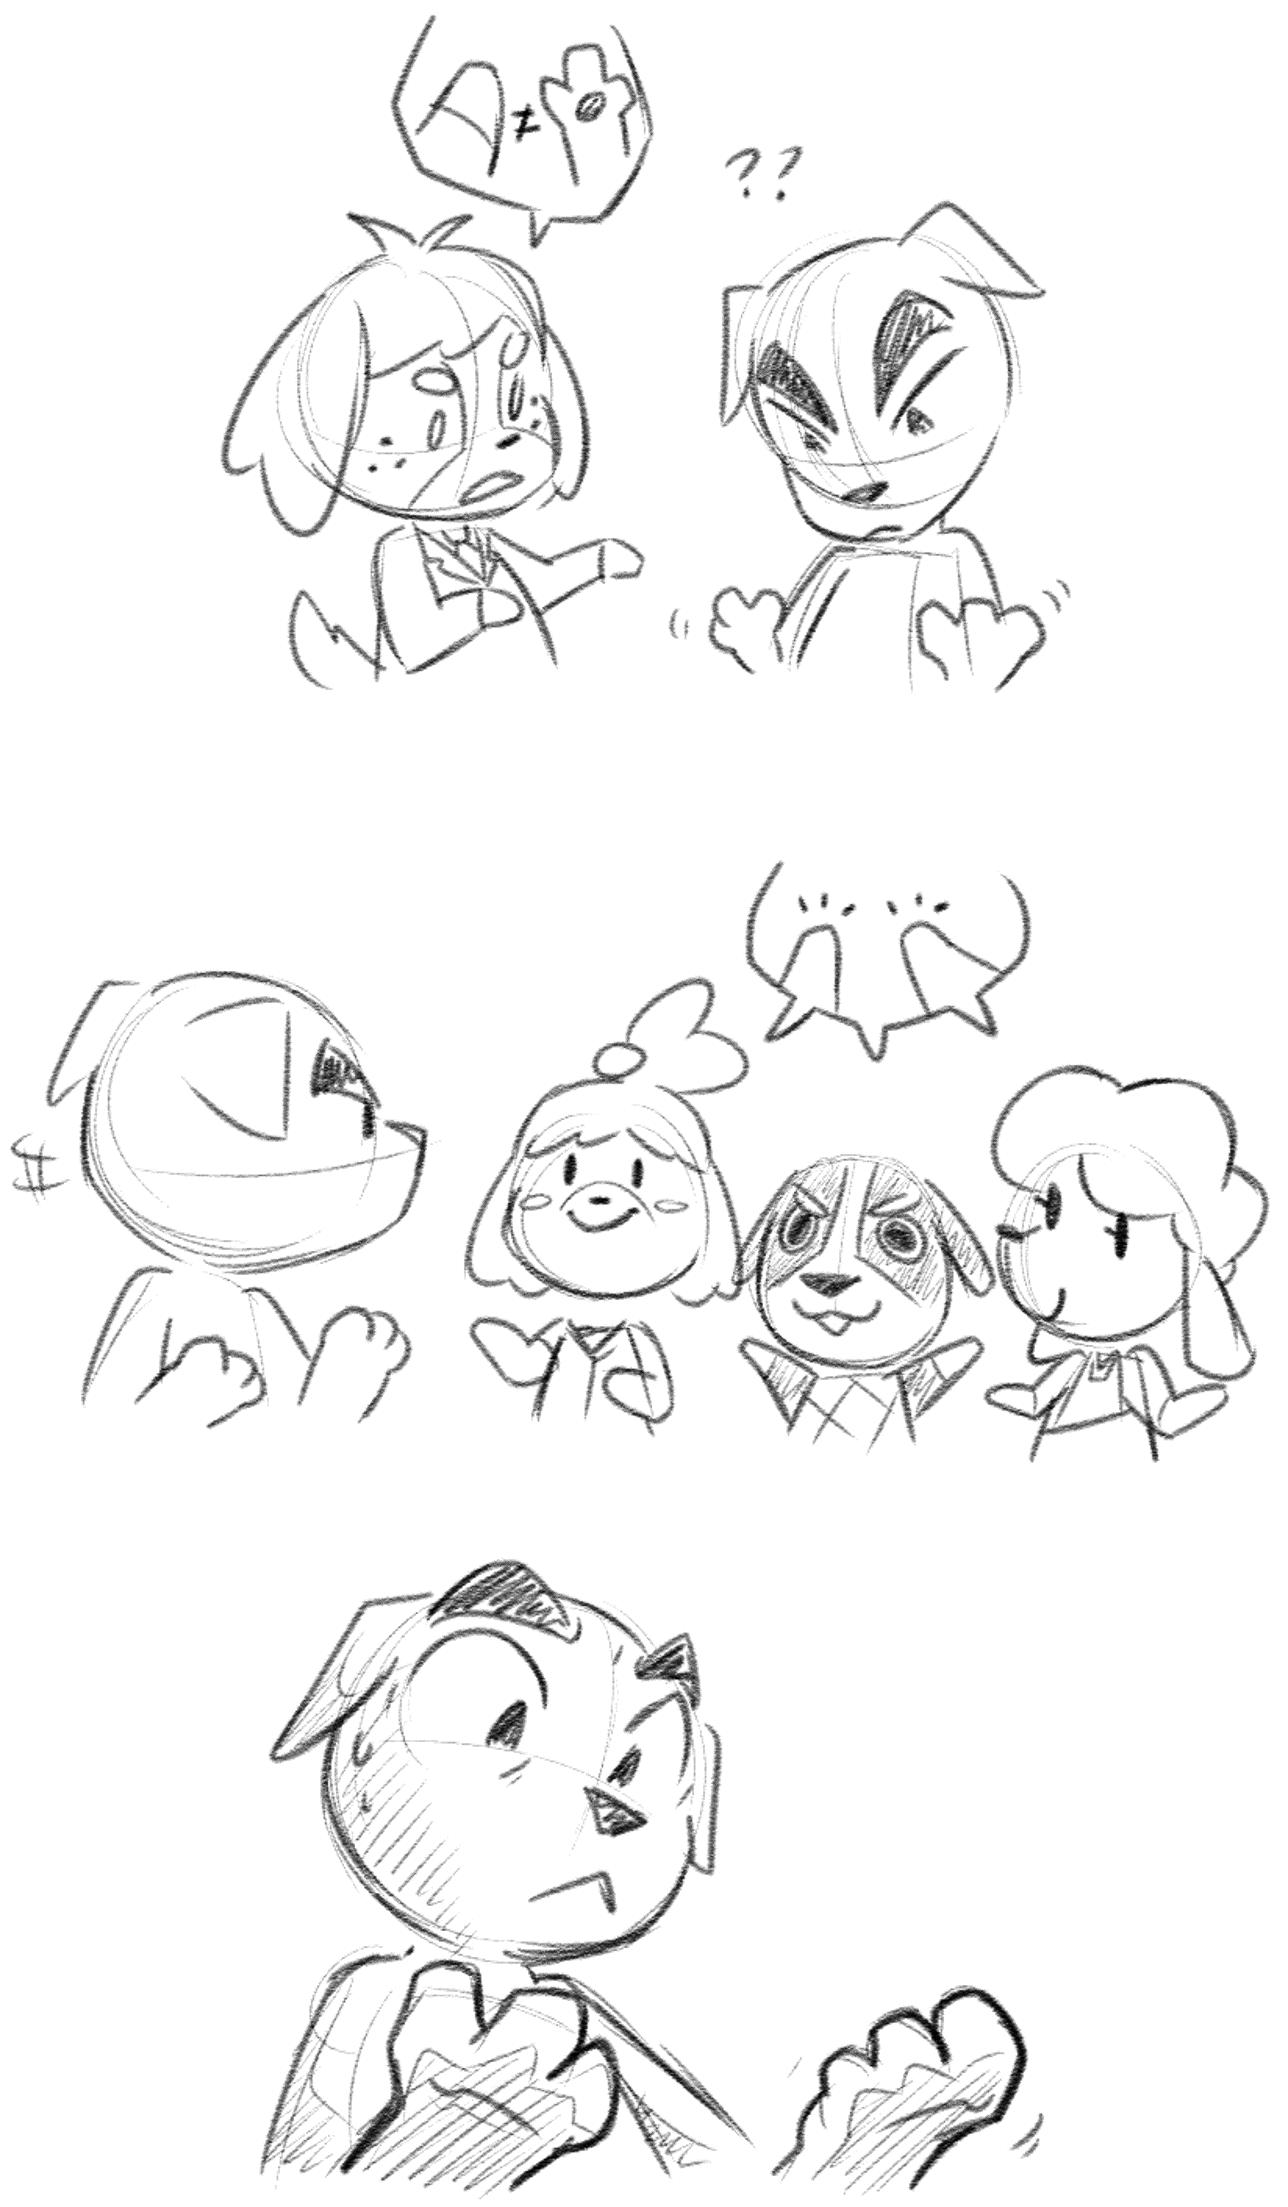 Hands Animal Crossing New Horizons Animal Crossing Funny Animal Crossing Animal Crossing Fan Art